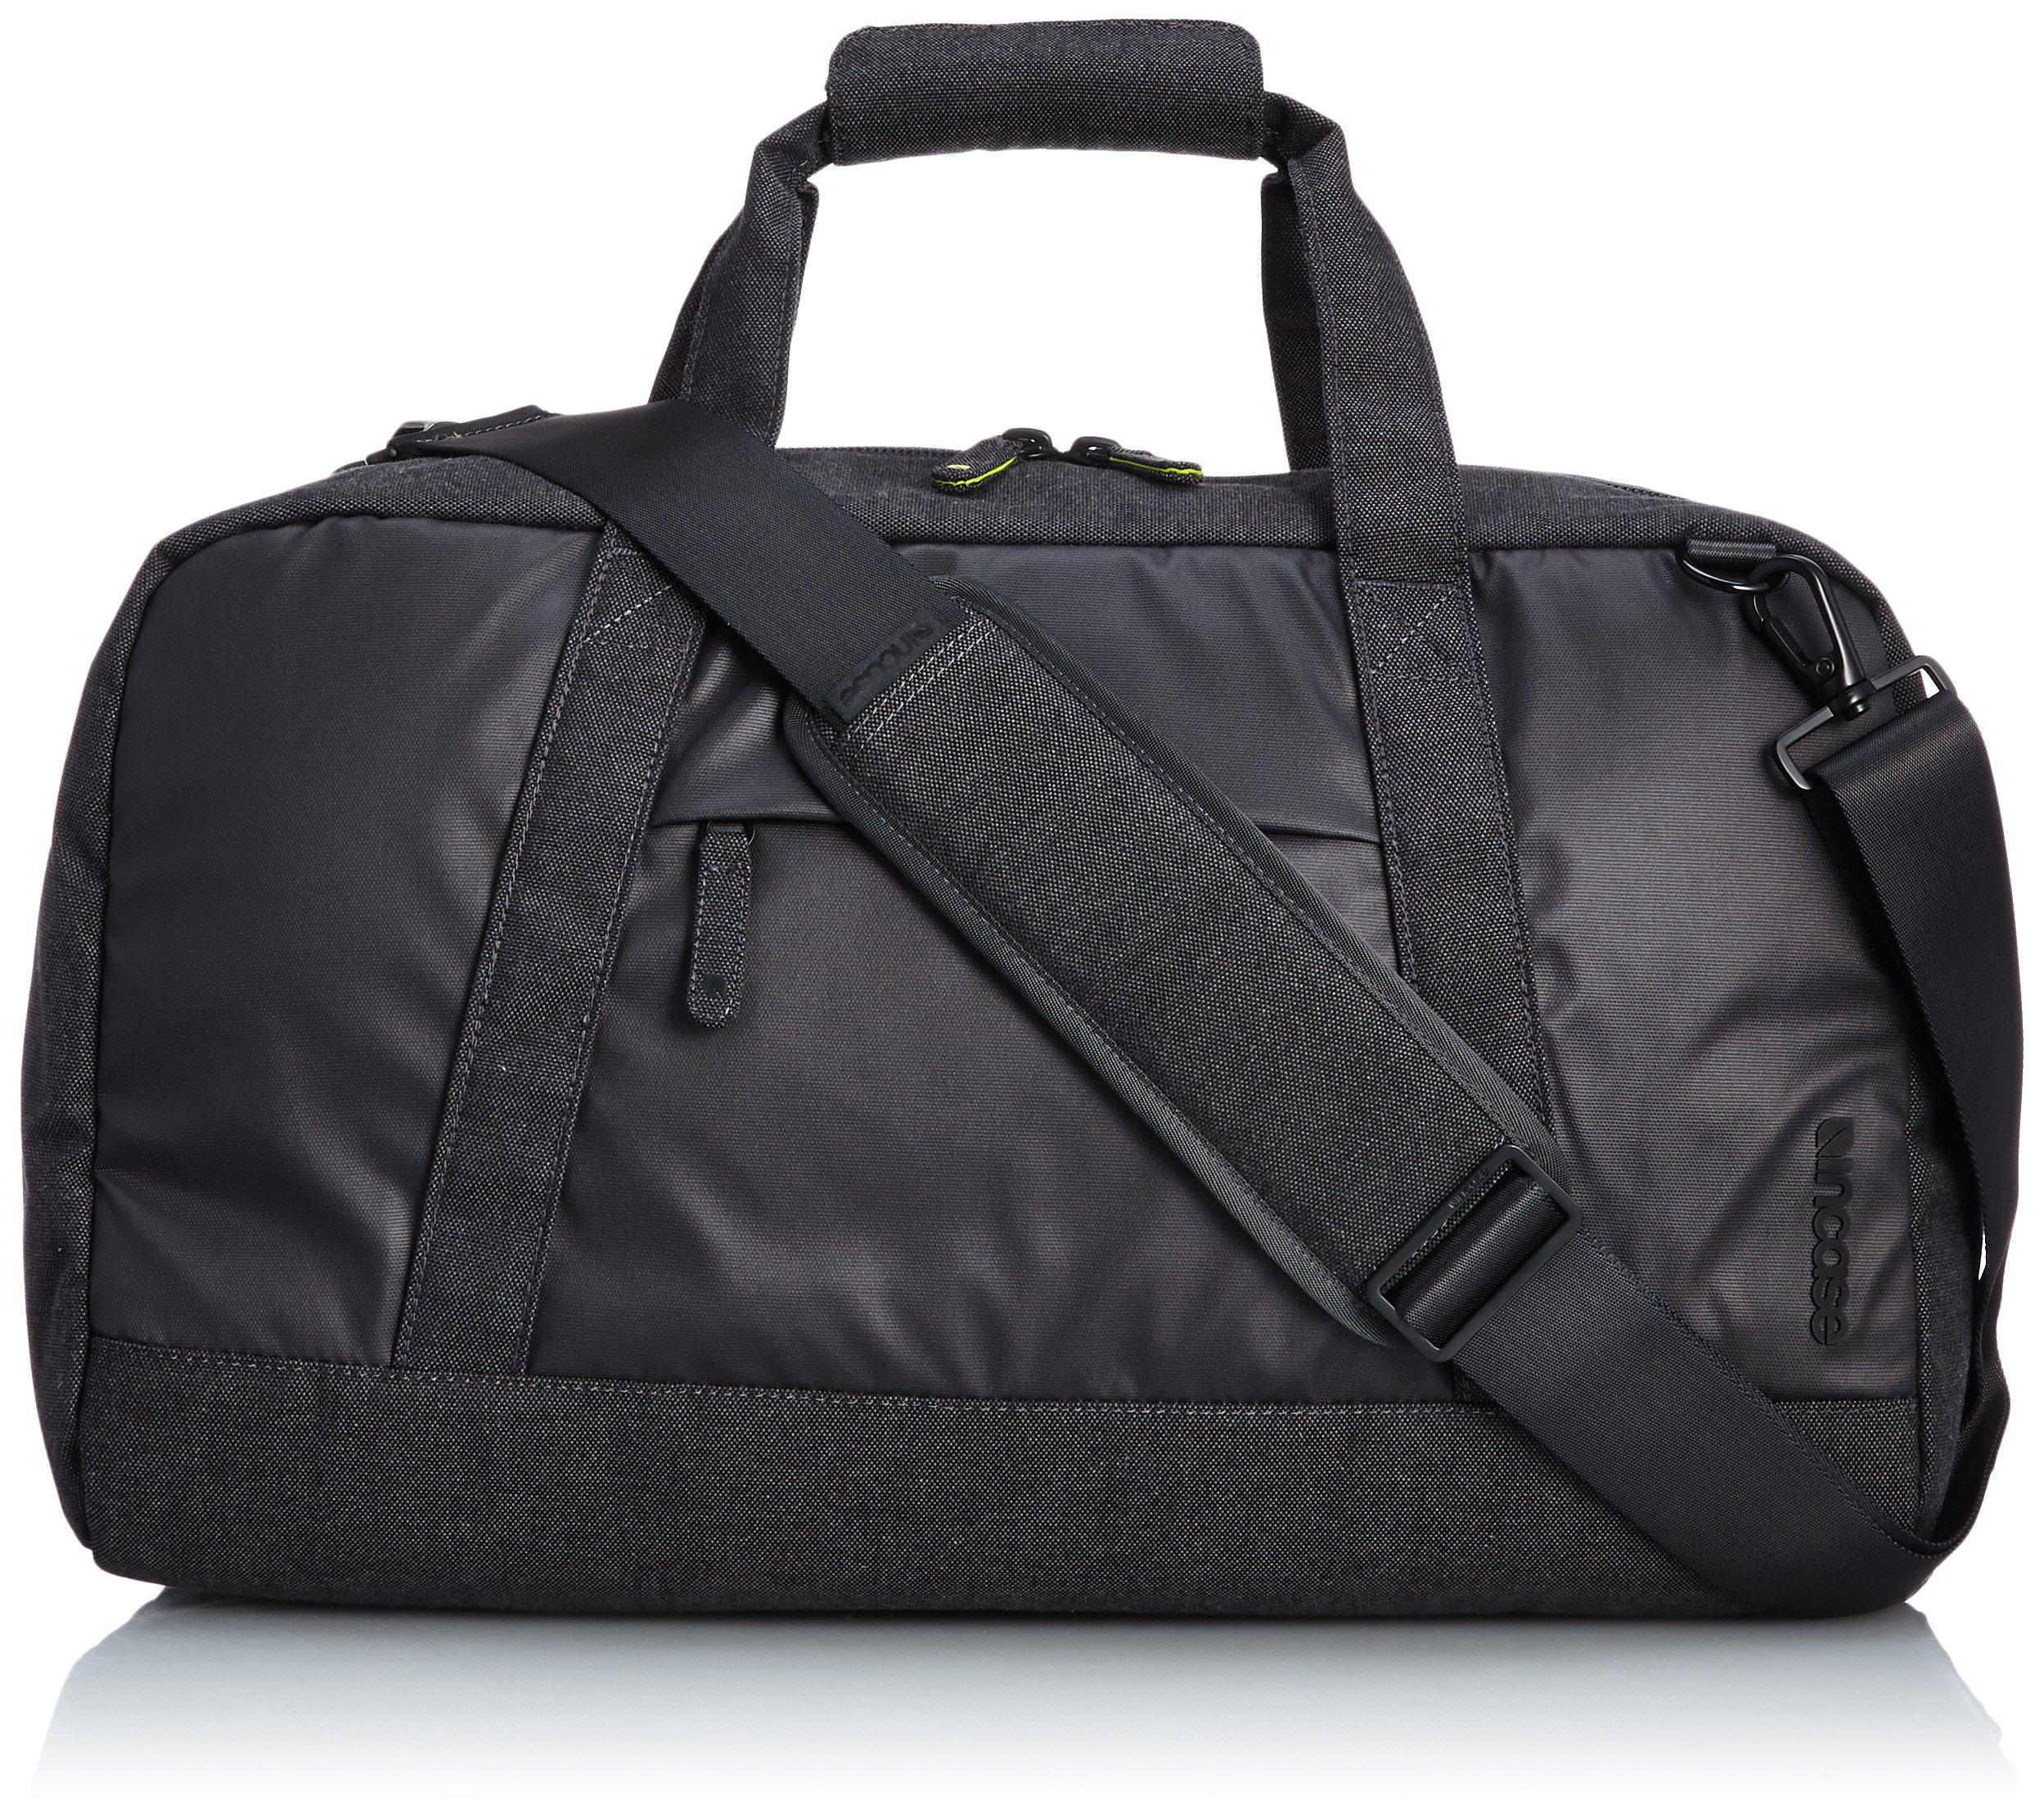 Incase Eo Travel Duffel, Black, One Size